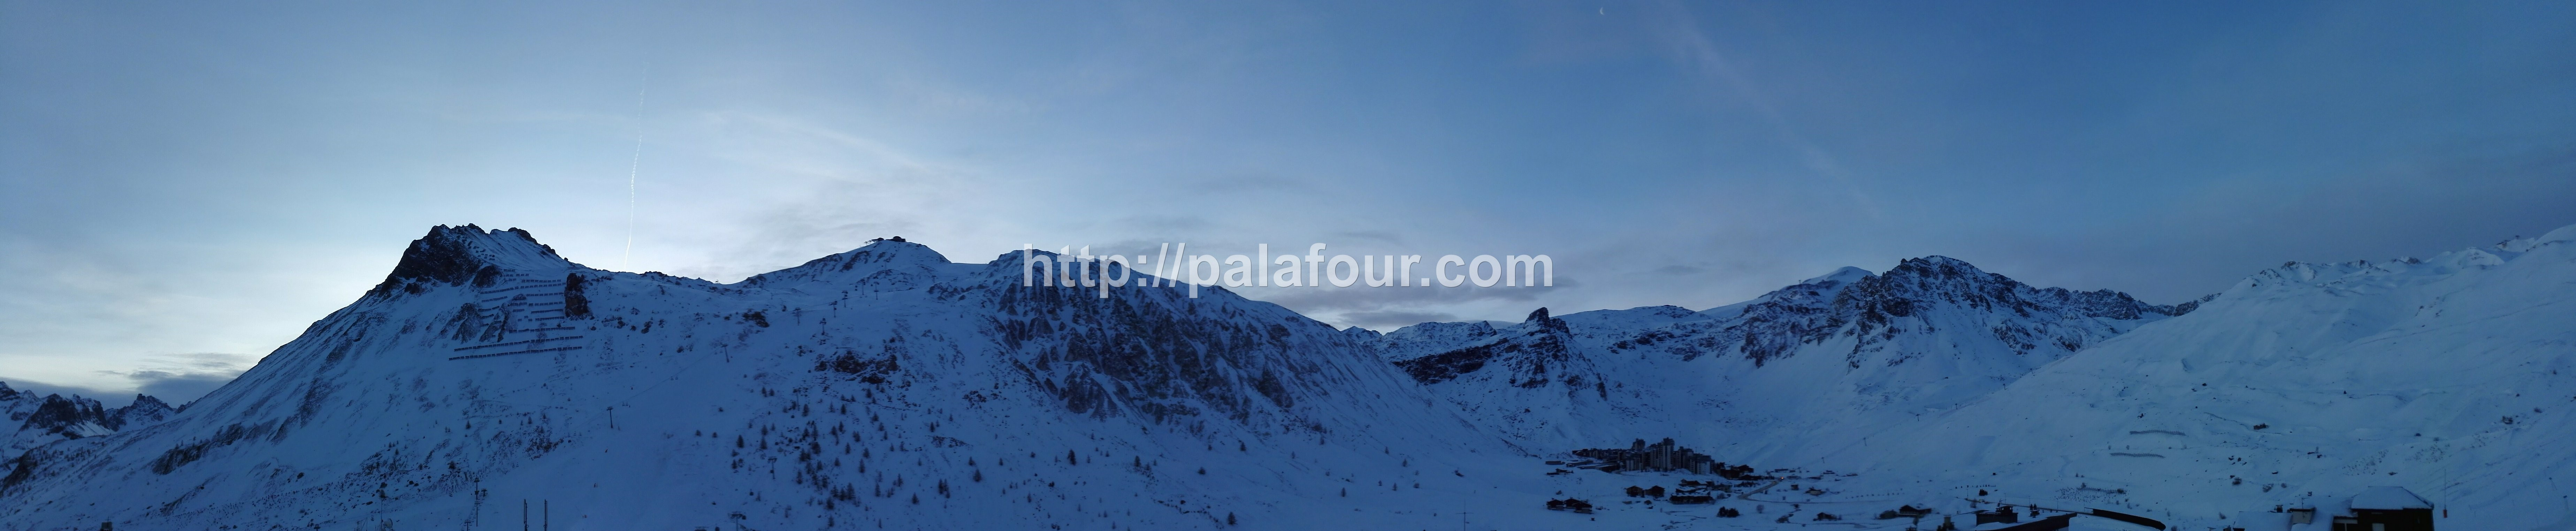 Tignes - Landscape - Panorama le matin